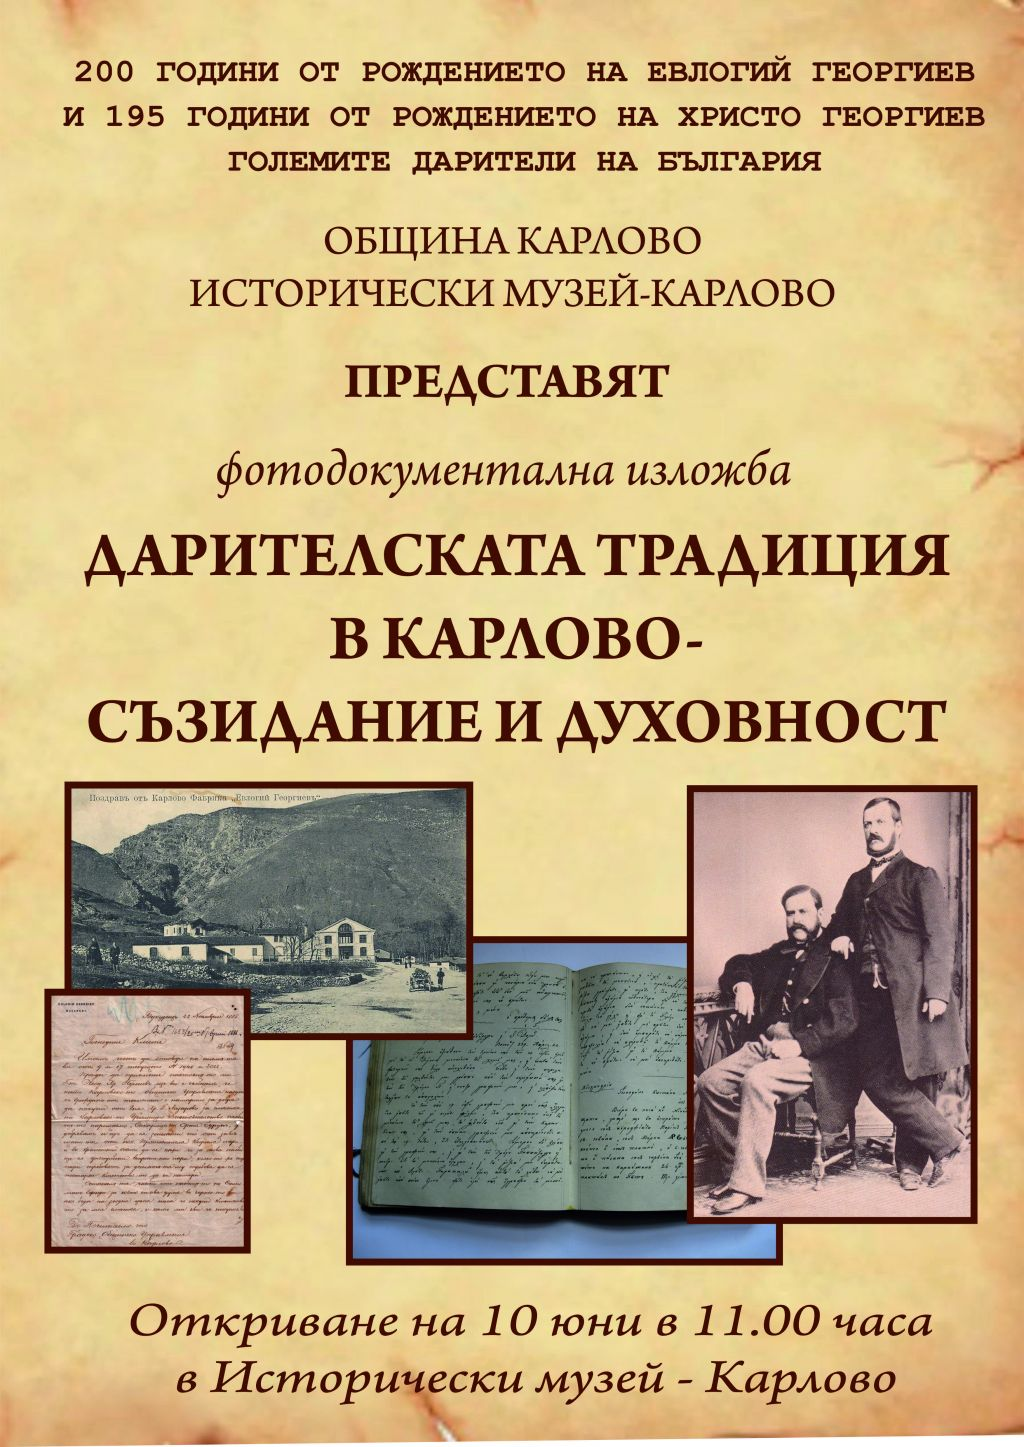 200 years since the birth of Evlogi Georgiev and 195 years since the birth of Hristo Georgiev - big image